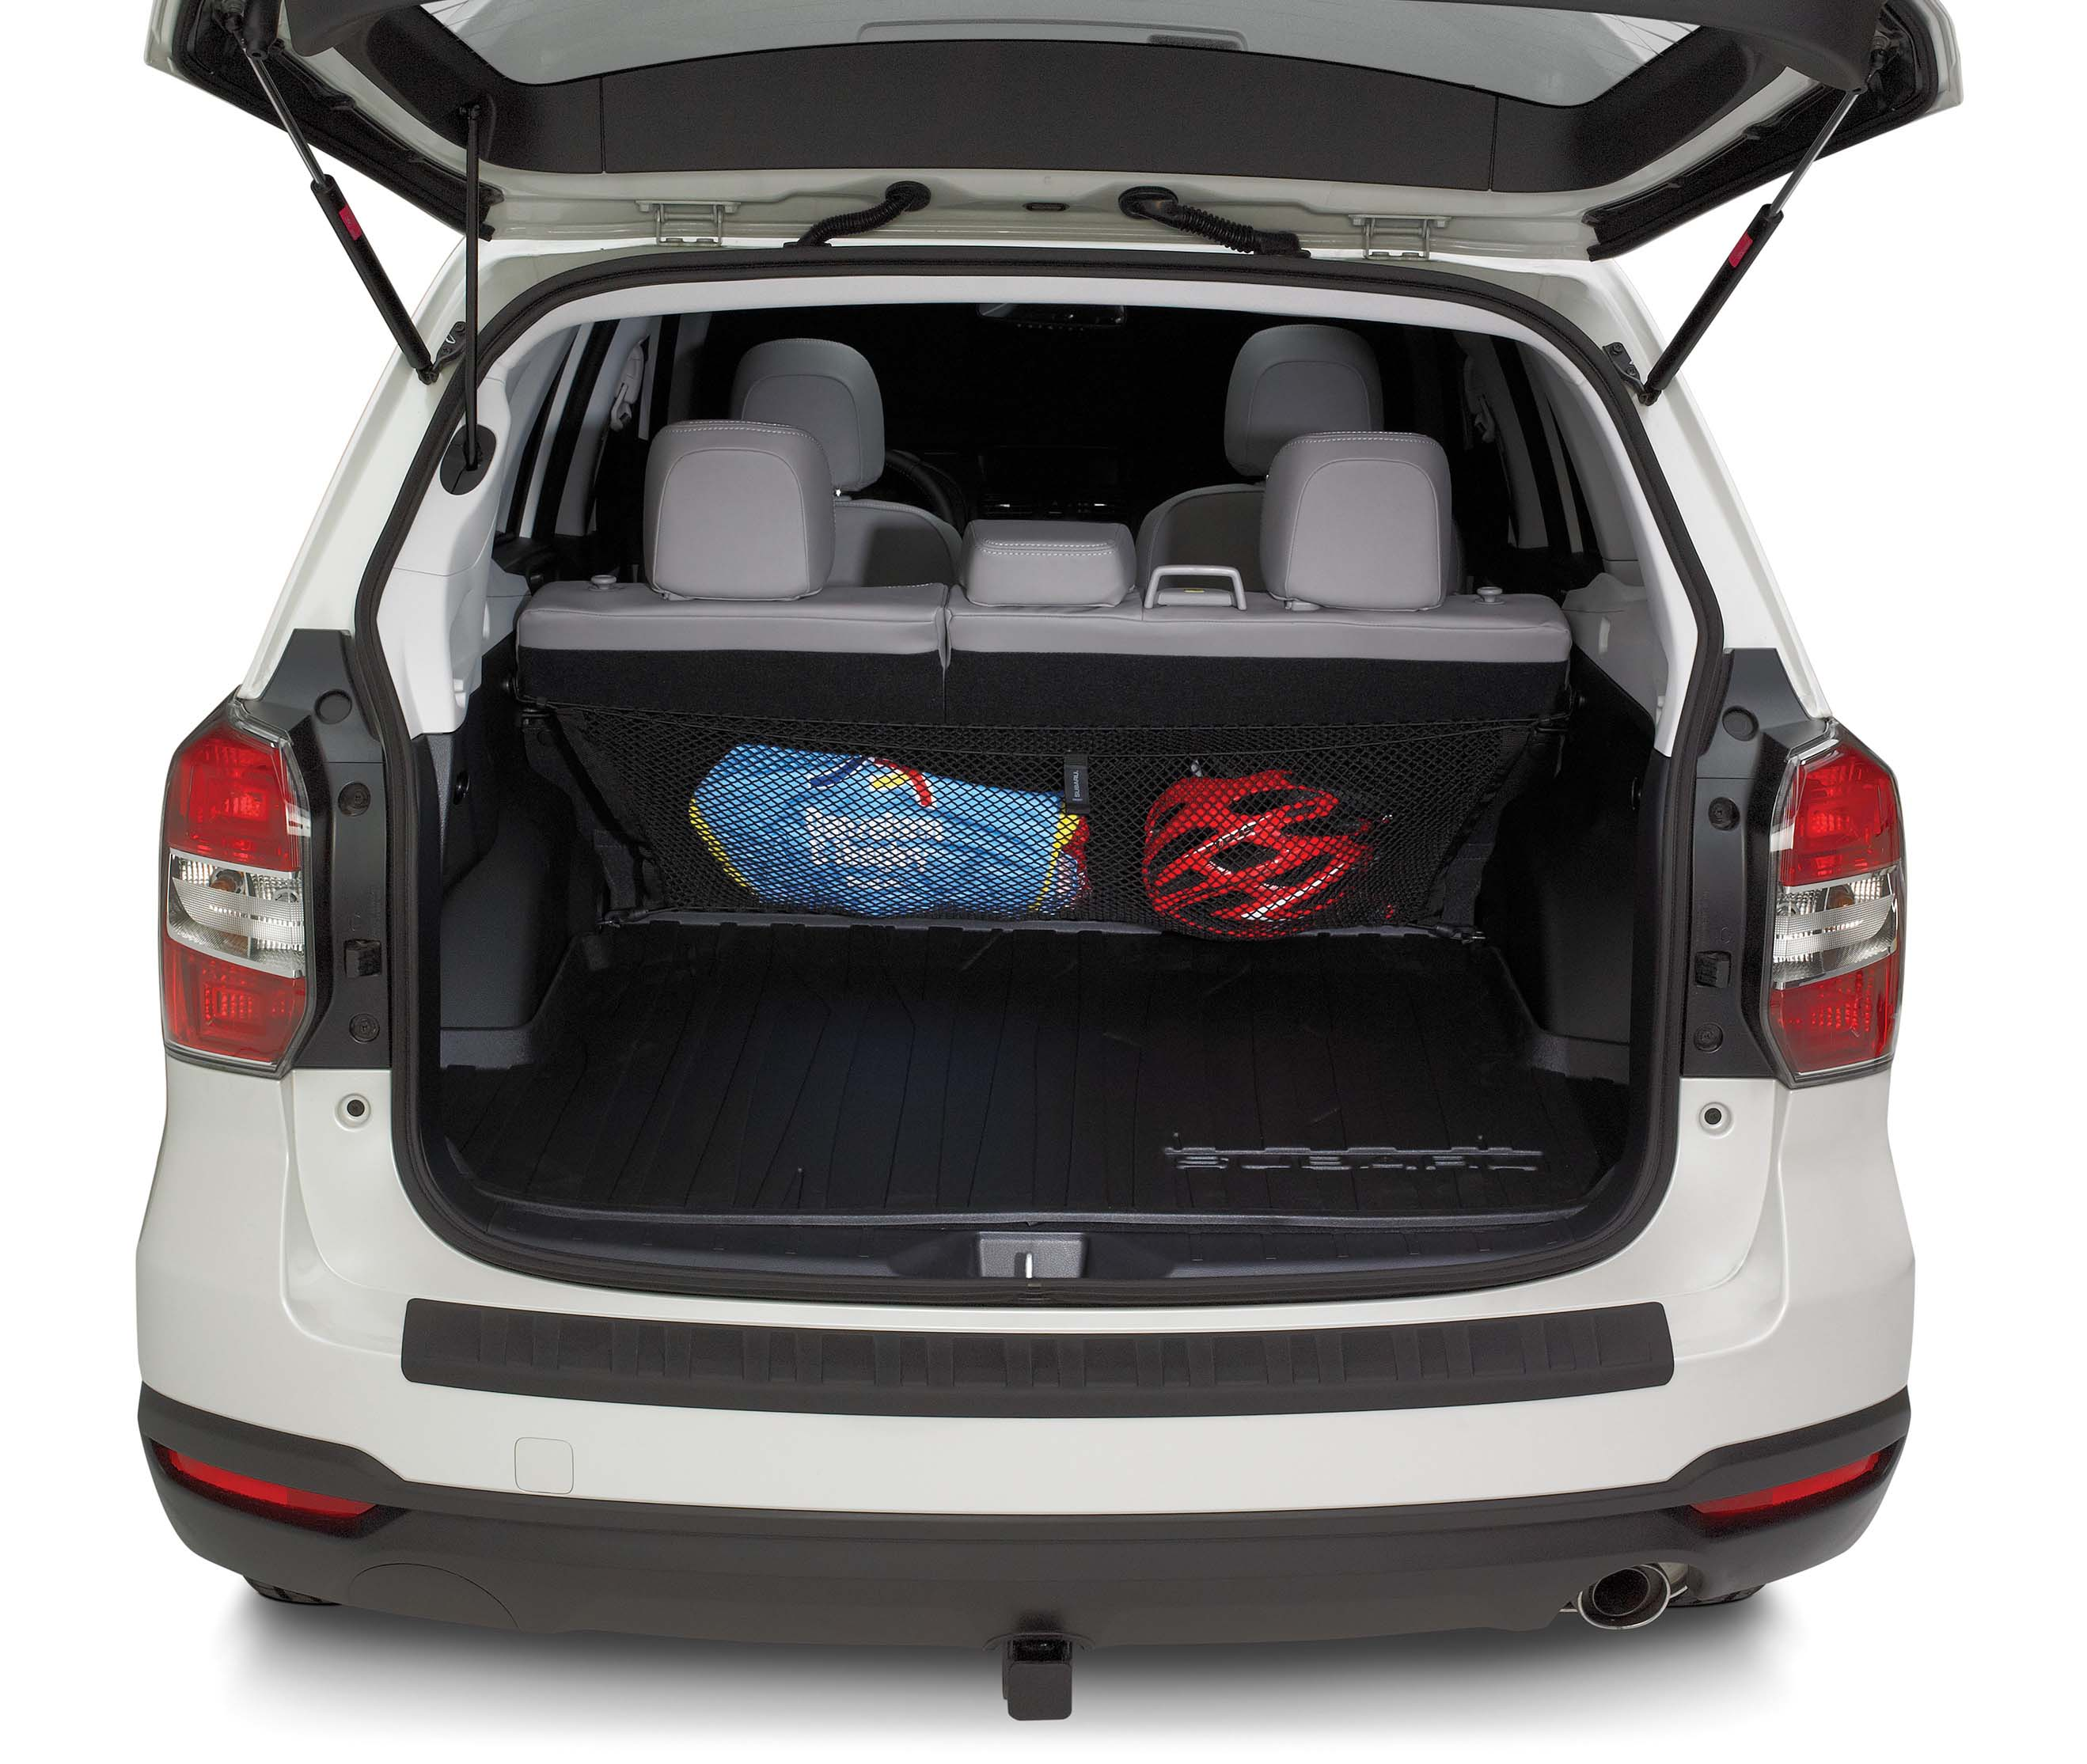 Subaru Forester Aftermarket Accessories Australia Best Accessories